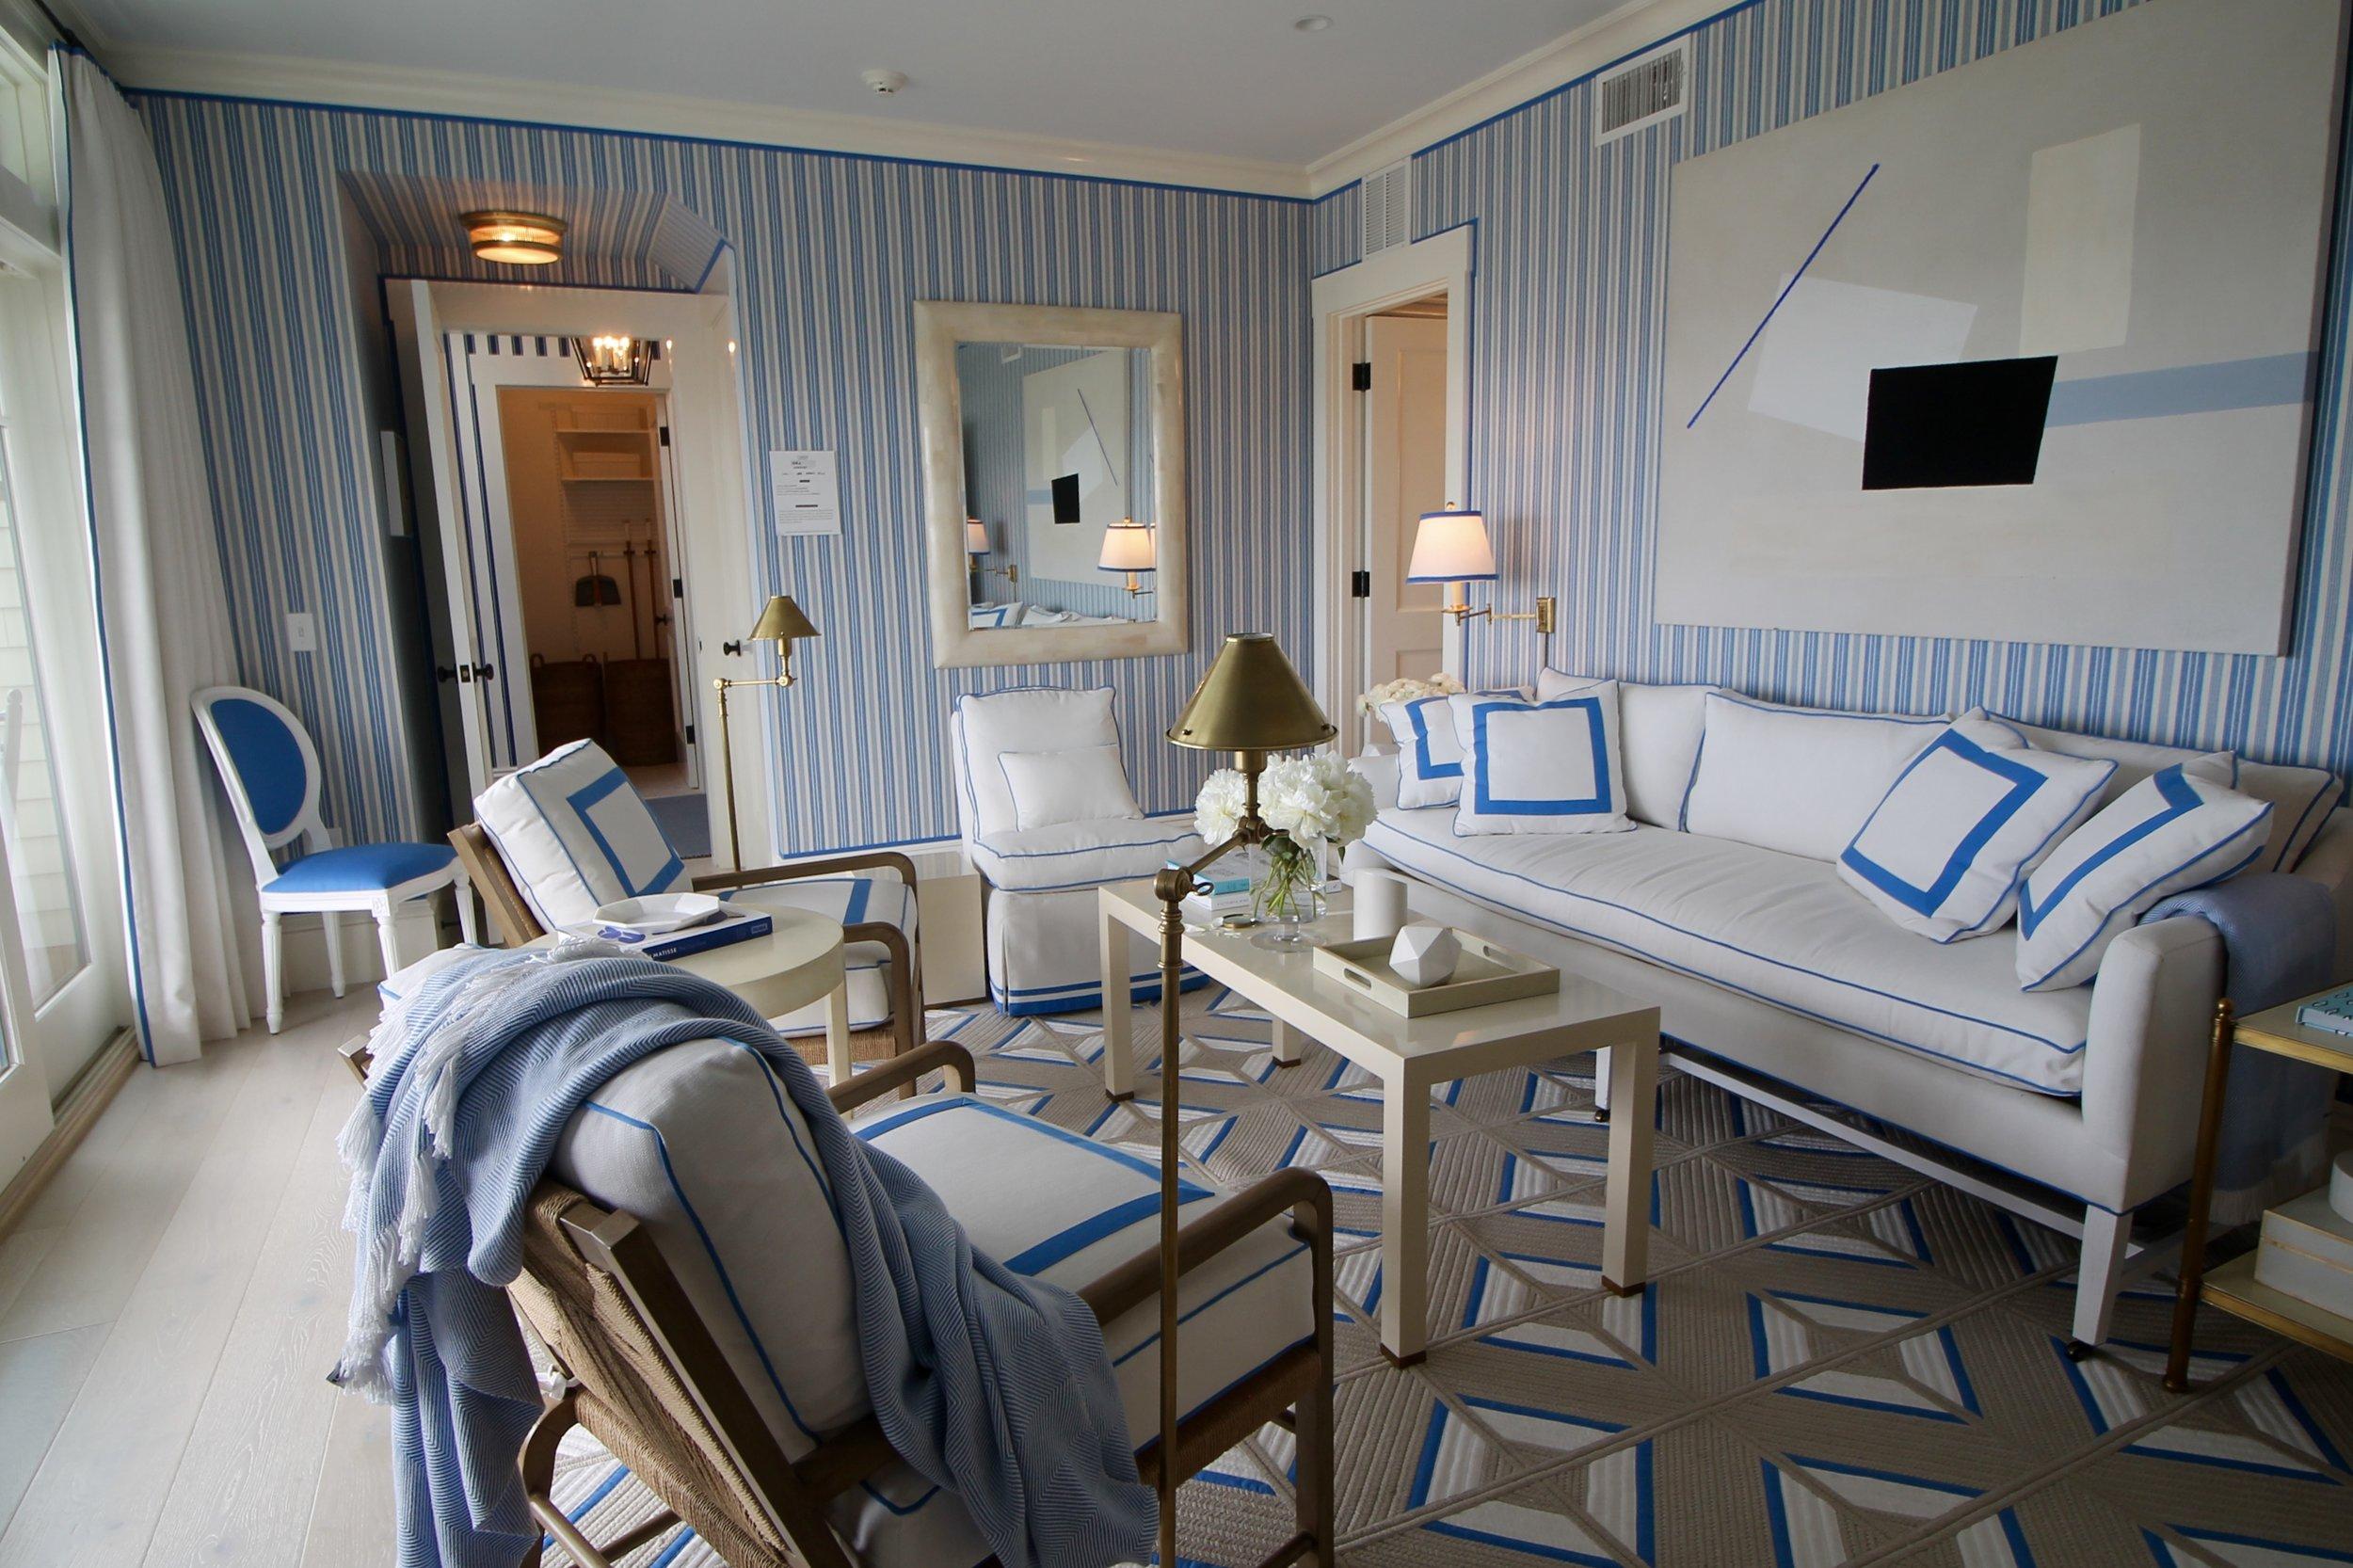 inside coastal living magazine's 2017 idea house in newport, rhode